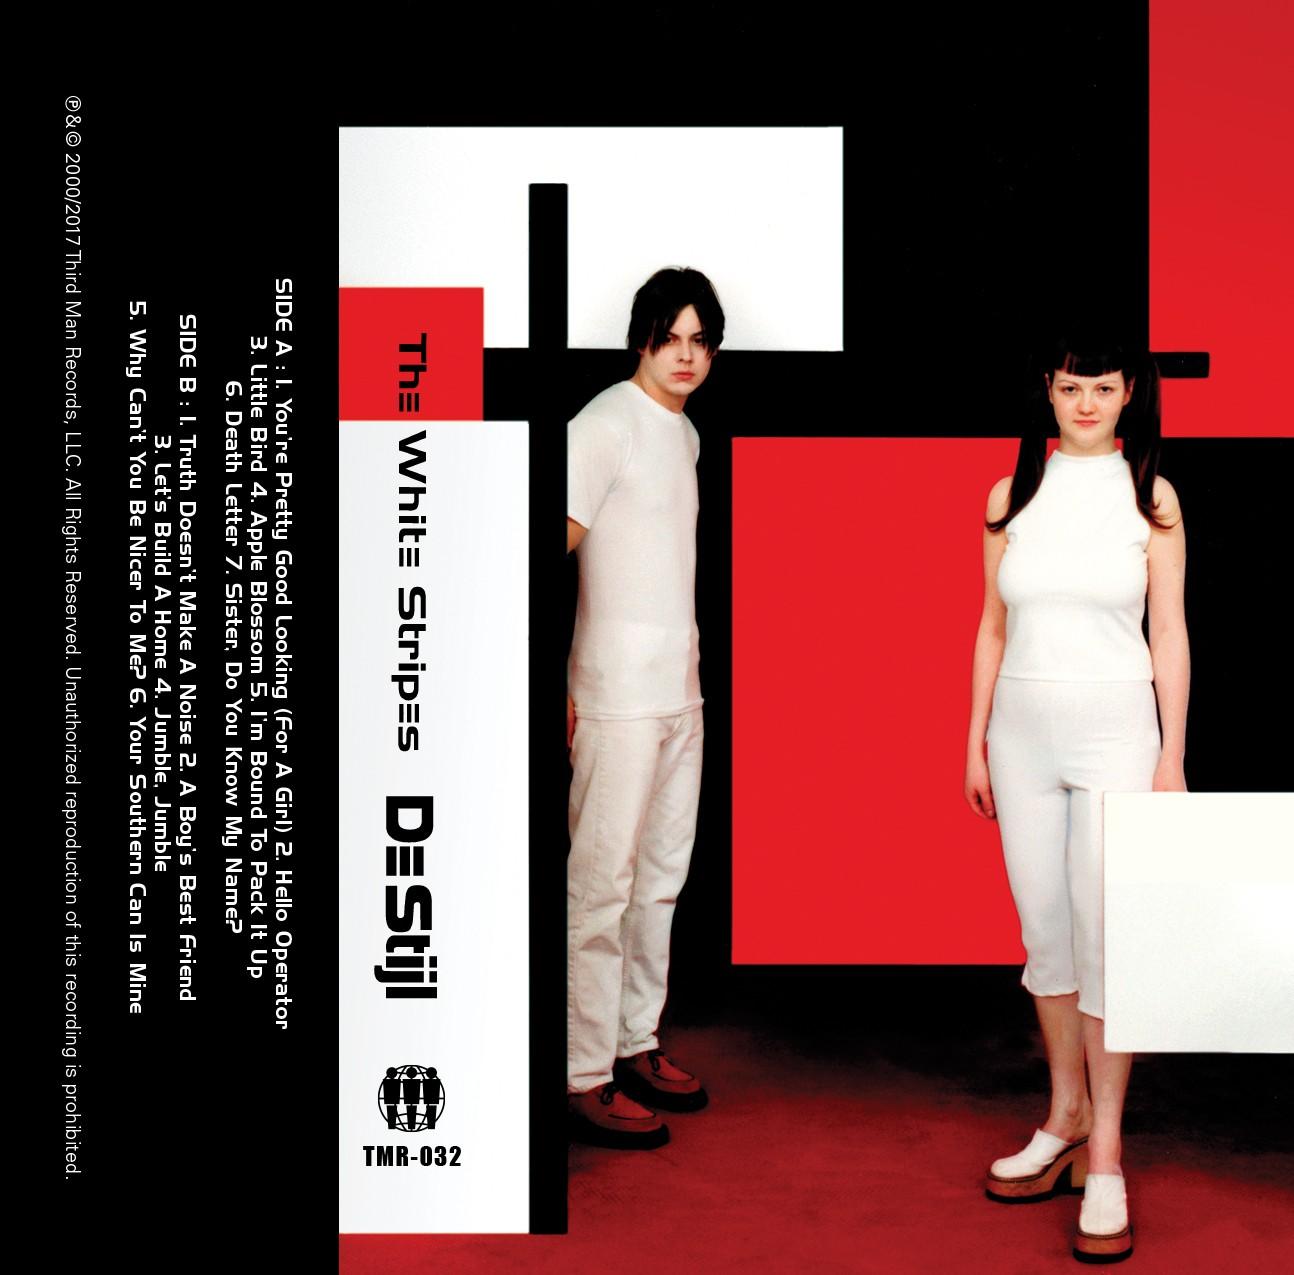 The White Stripes - De Stijl Cassette